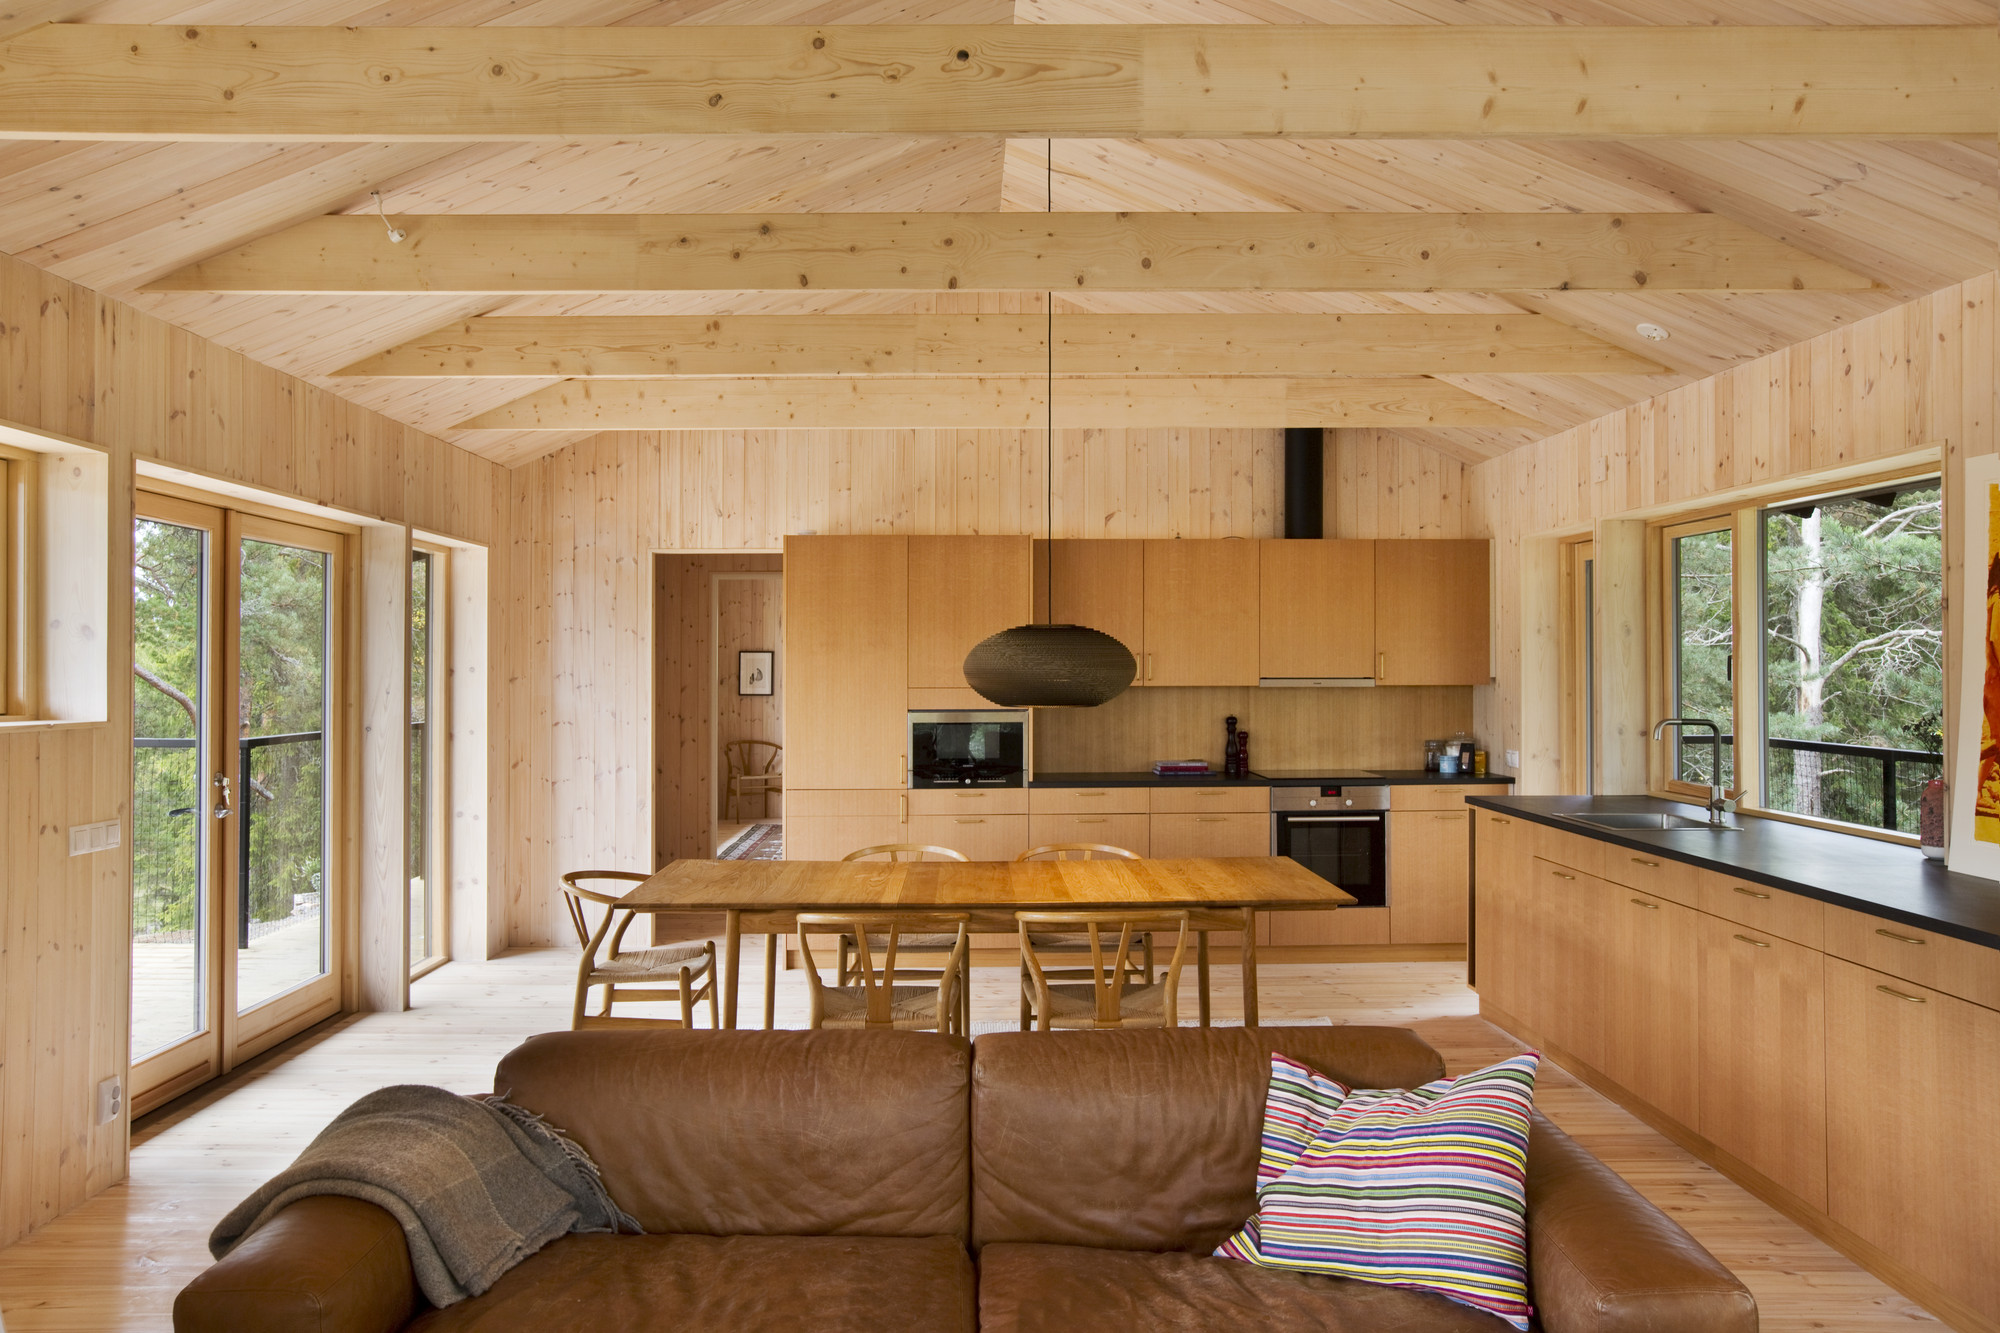 Galeria de casa de veraneio vind max holst 9 - Decoracion casas de madera ...